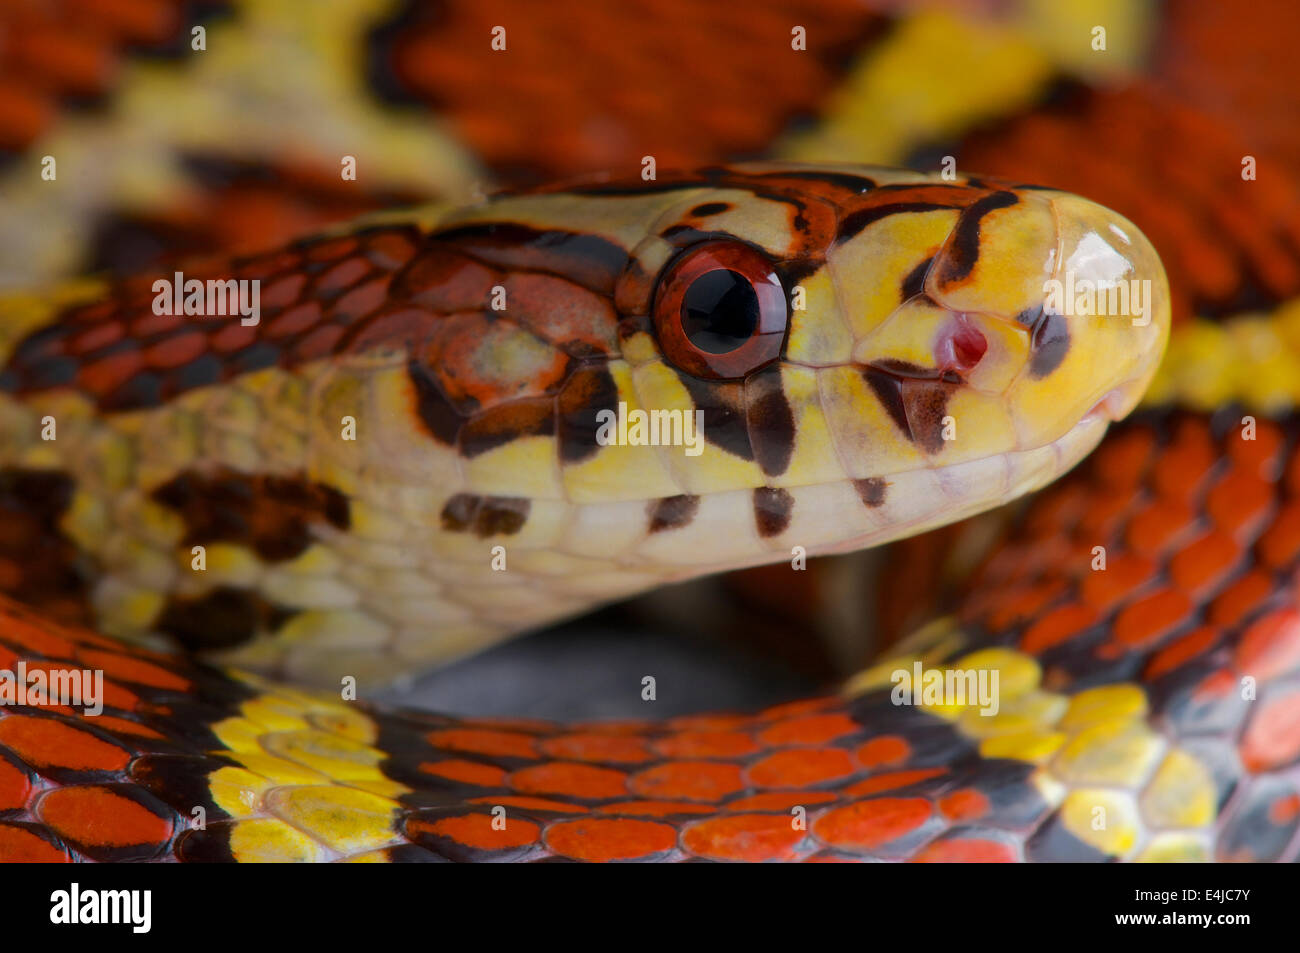 Bella ratsnake / Archelaphe bella bella - Stock Image